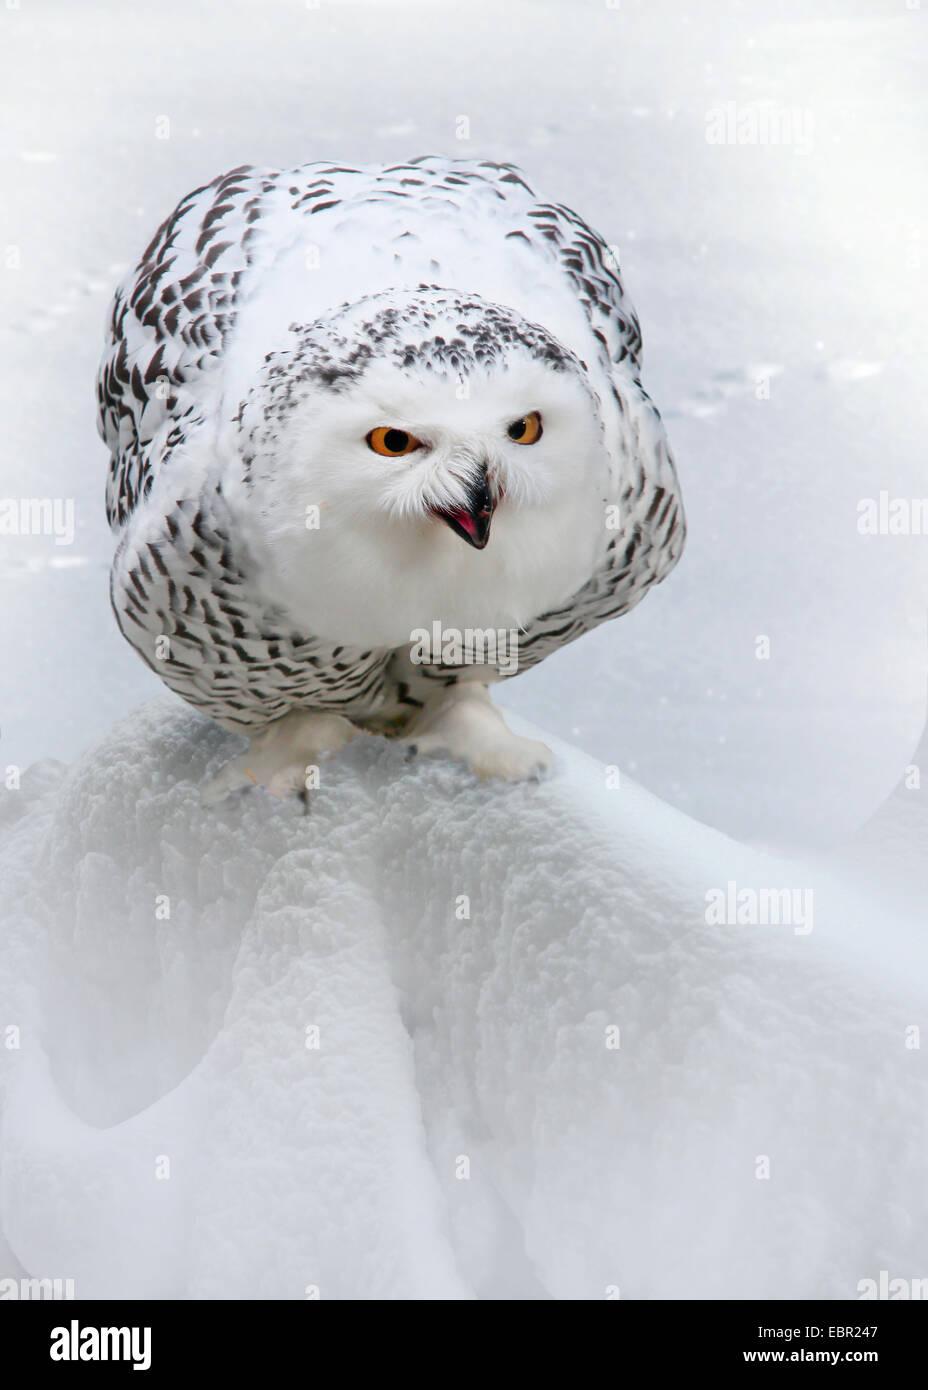 Snowy Owl (Strix, Nyctea scandiaca scandiaca, Bubo scandiacus), sentada en la nieve Imagen De Stock